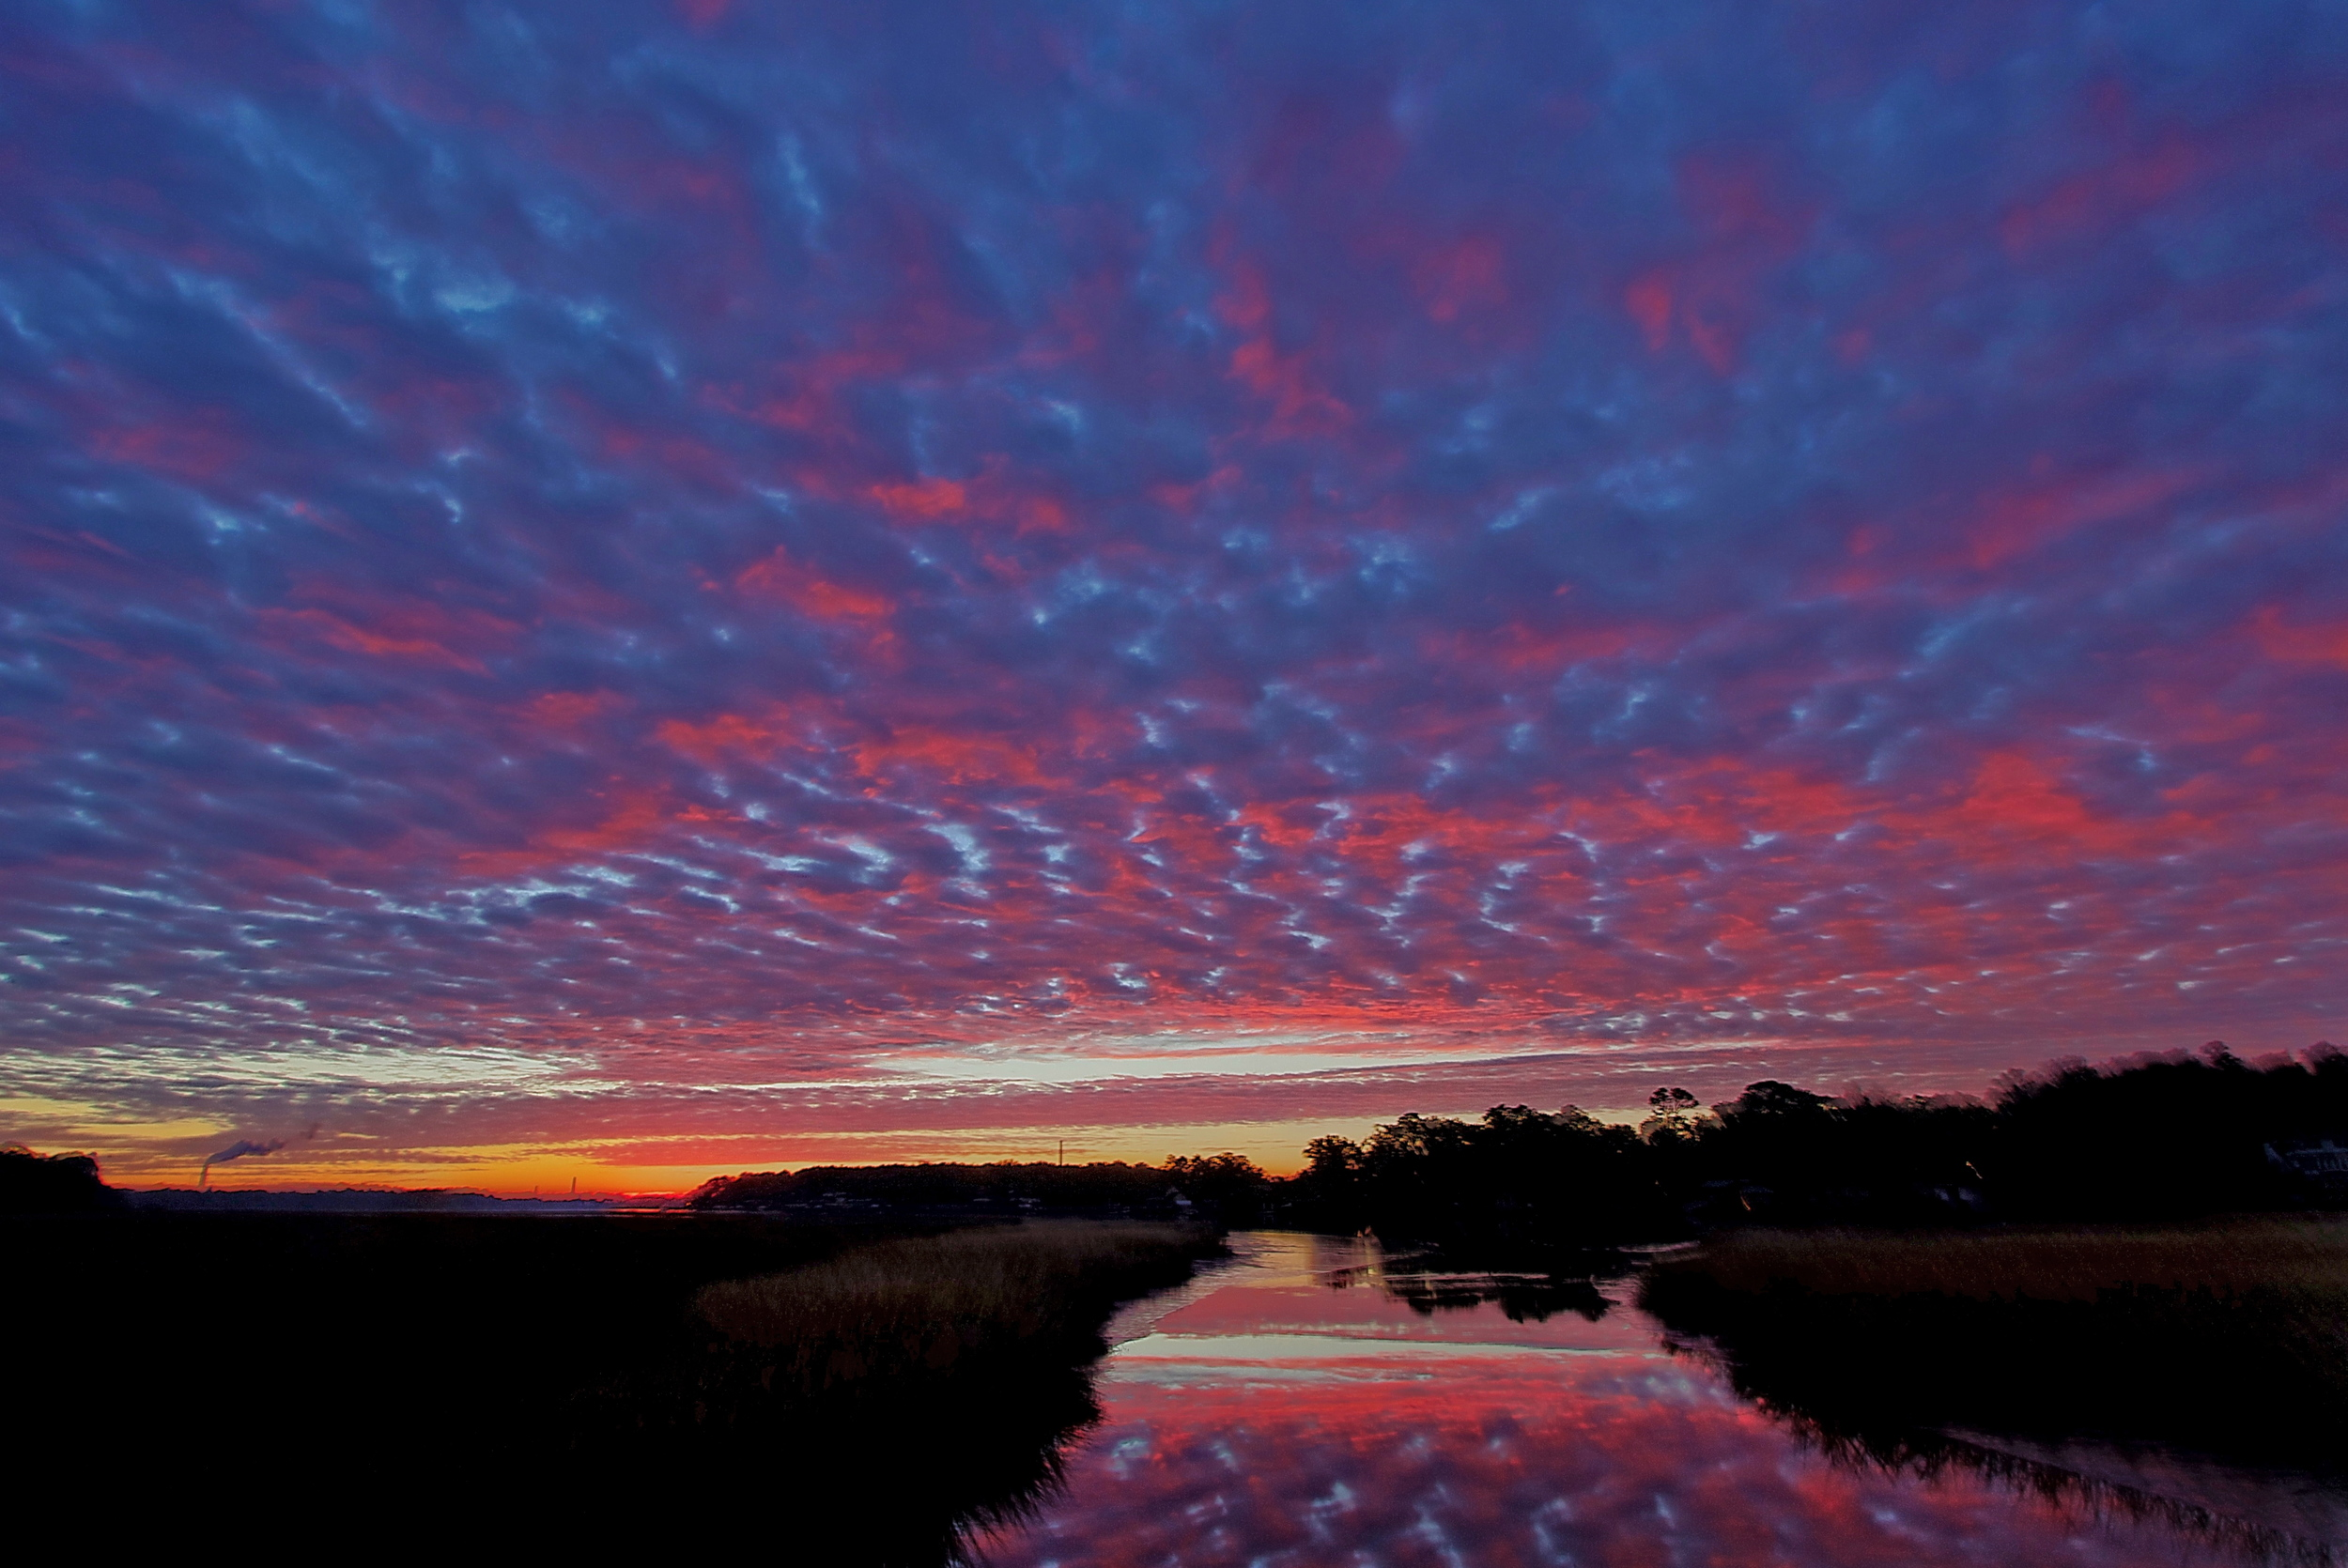 A red Mackerel sky over the Broward.